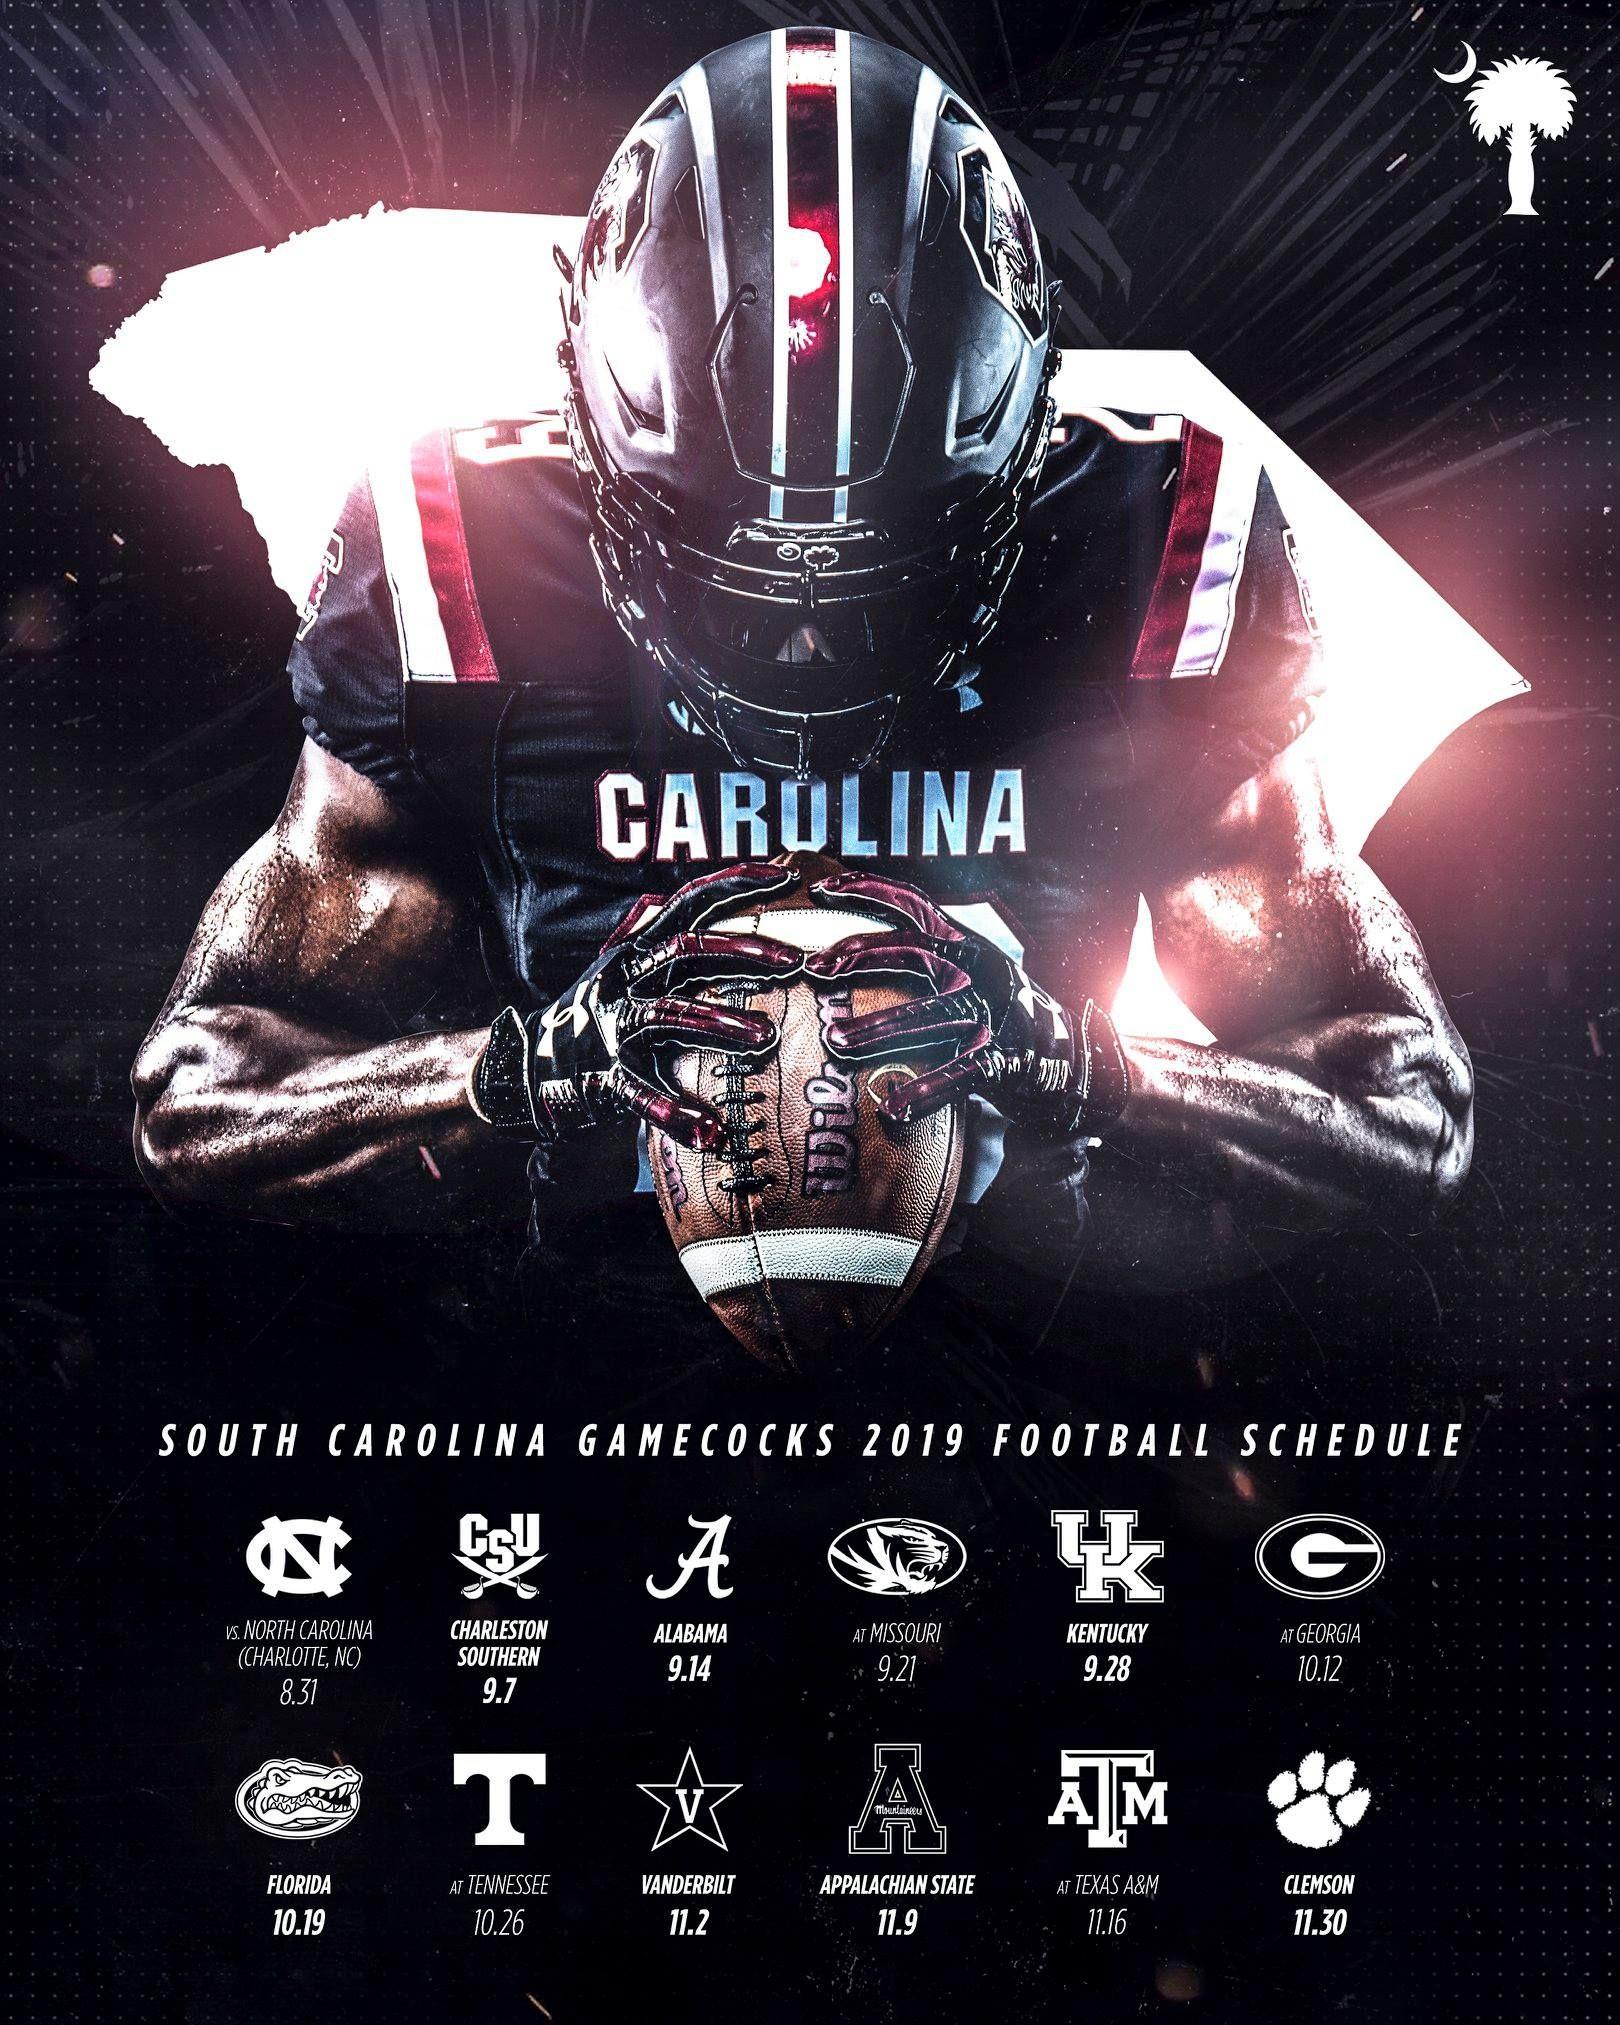 South Carolina Gamecocks 2019 Football Schedule Gamecocks